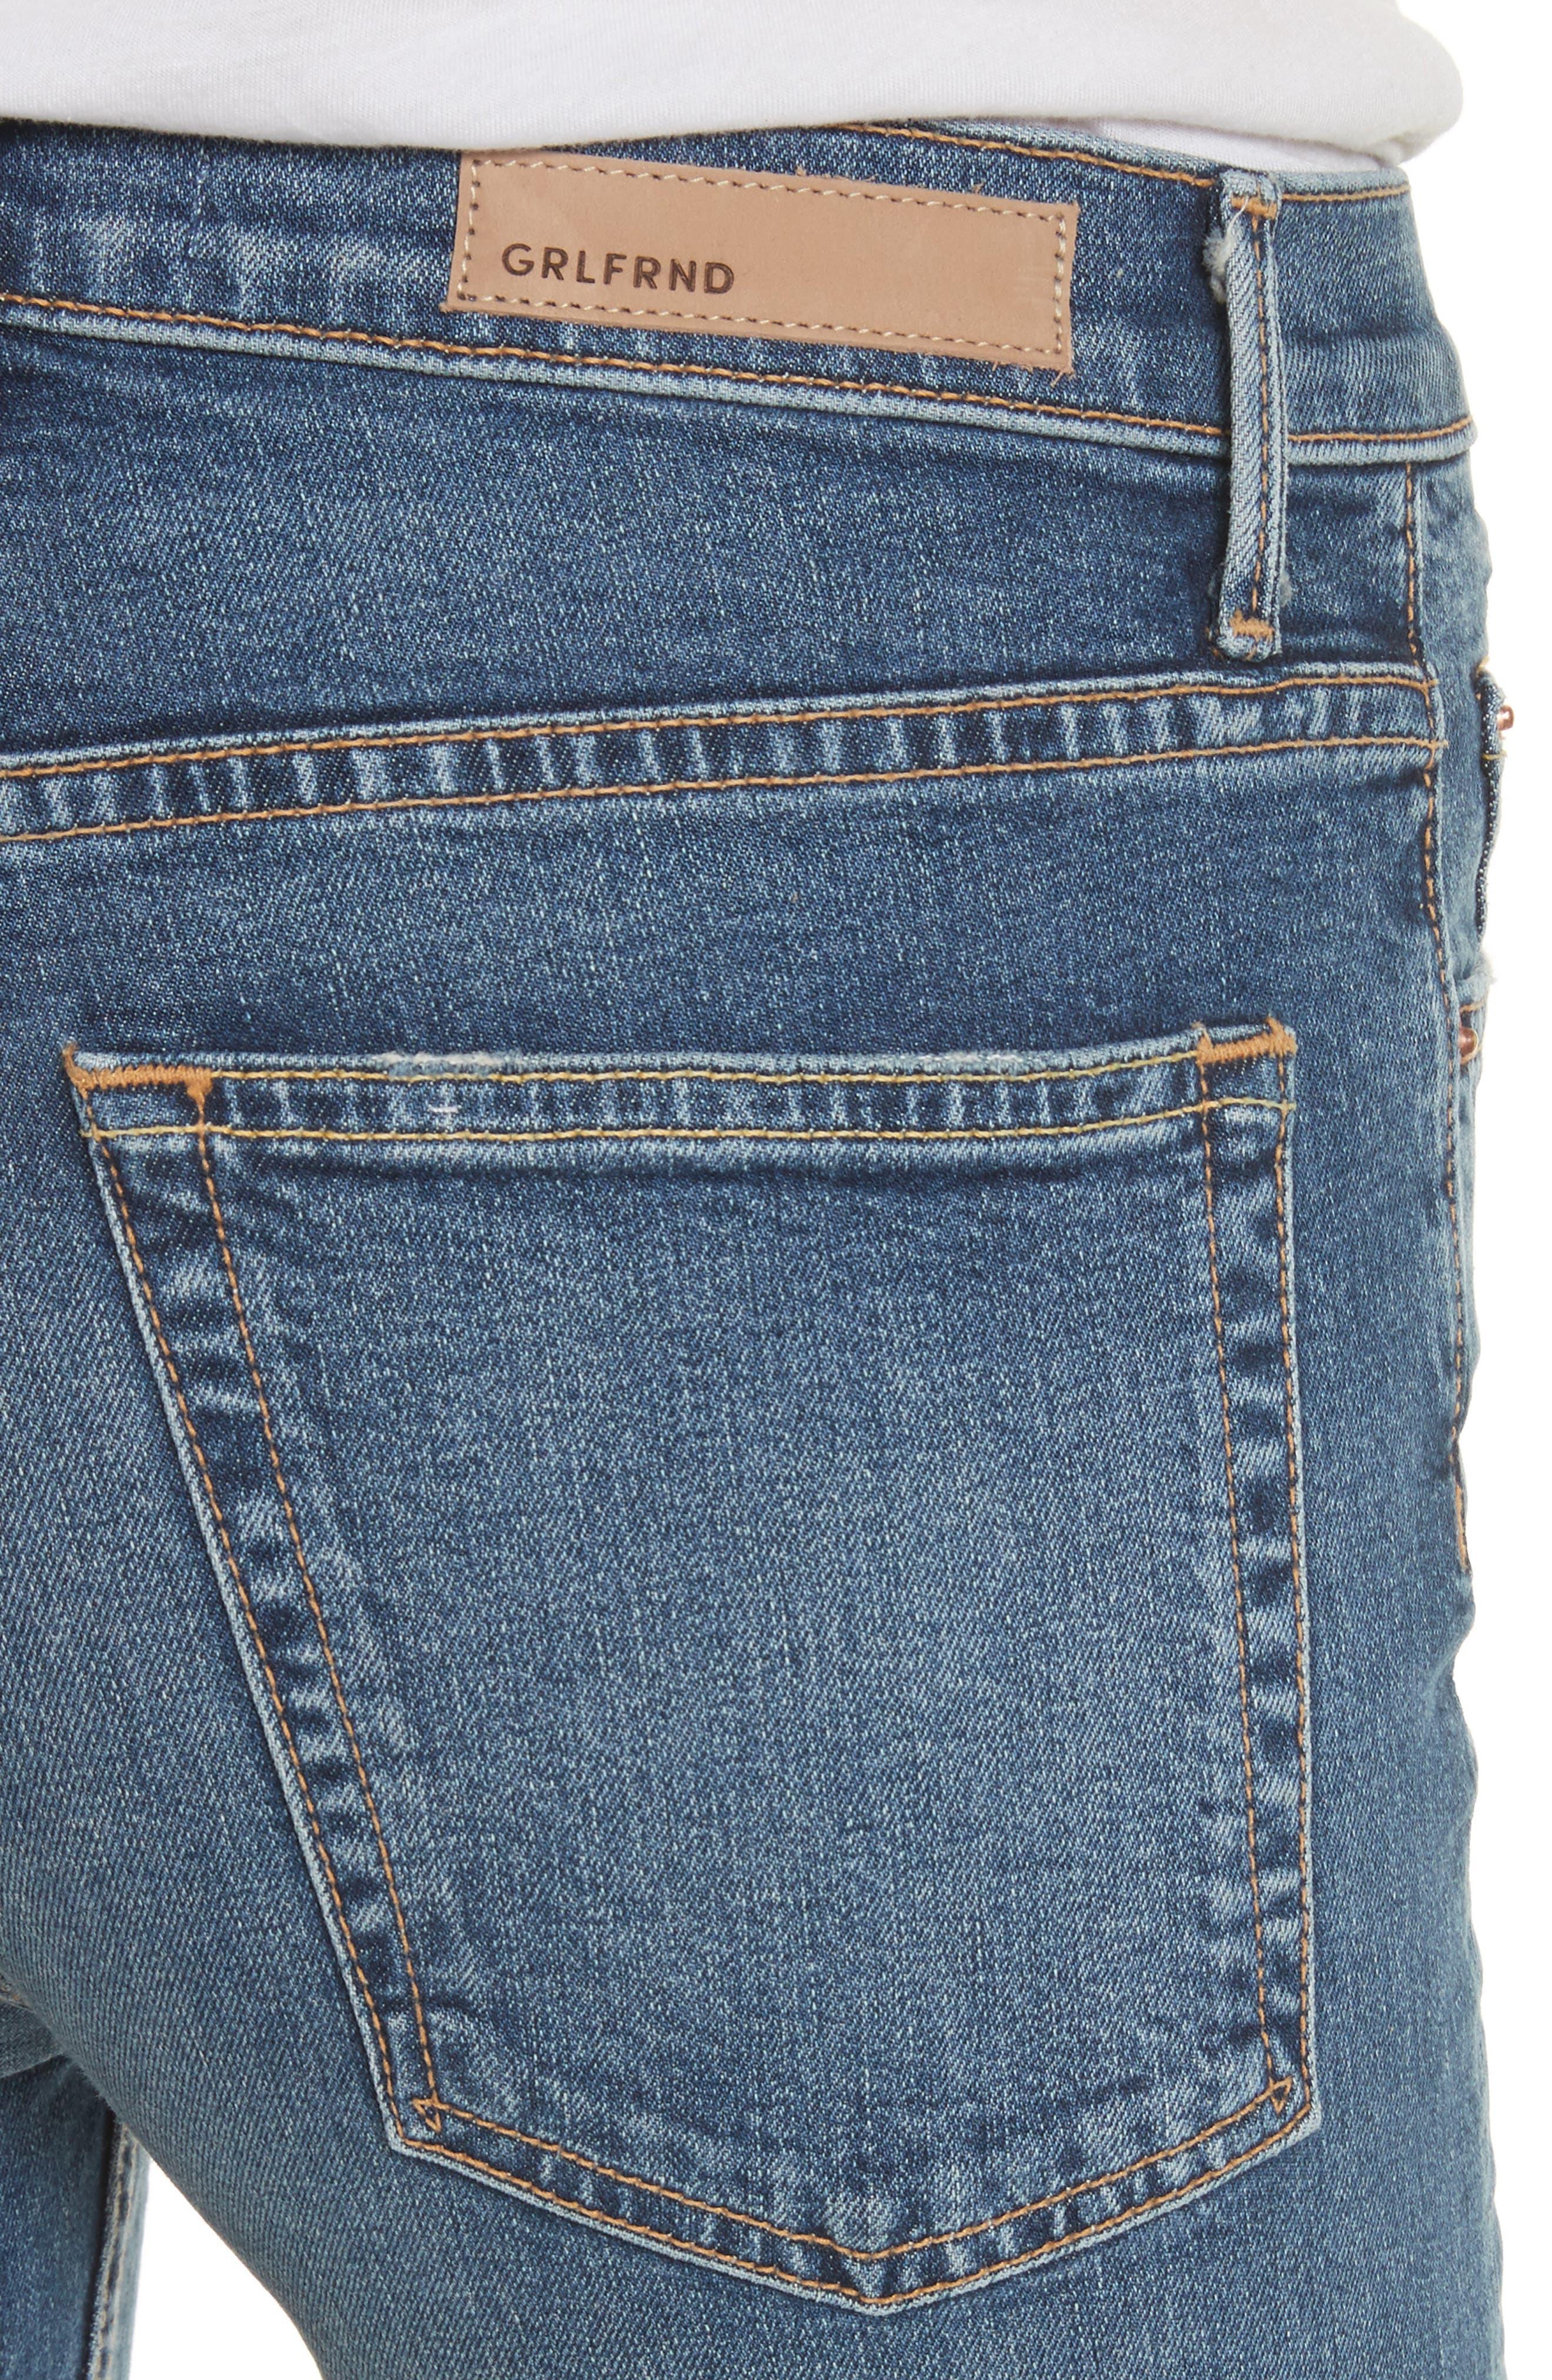 Alternate Image 4  - GRLFRND Kendall Super Stretch High Waist Skinny Jeans (No More Tears)